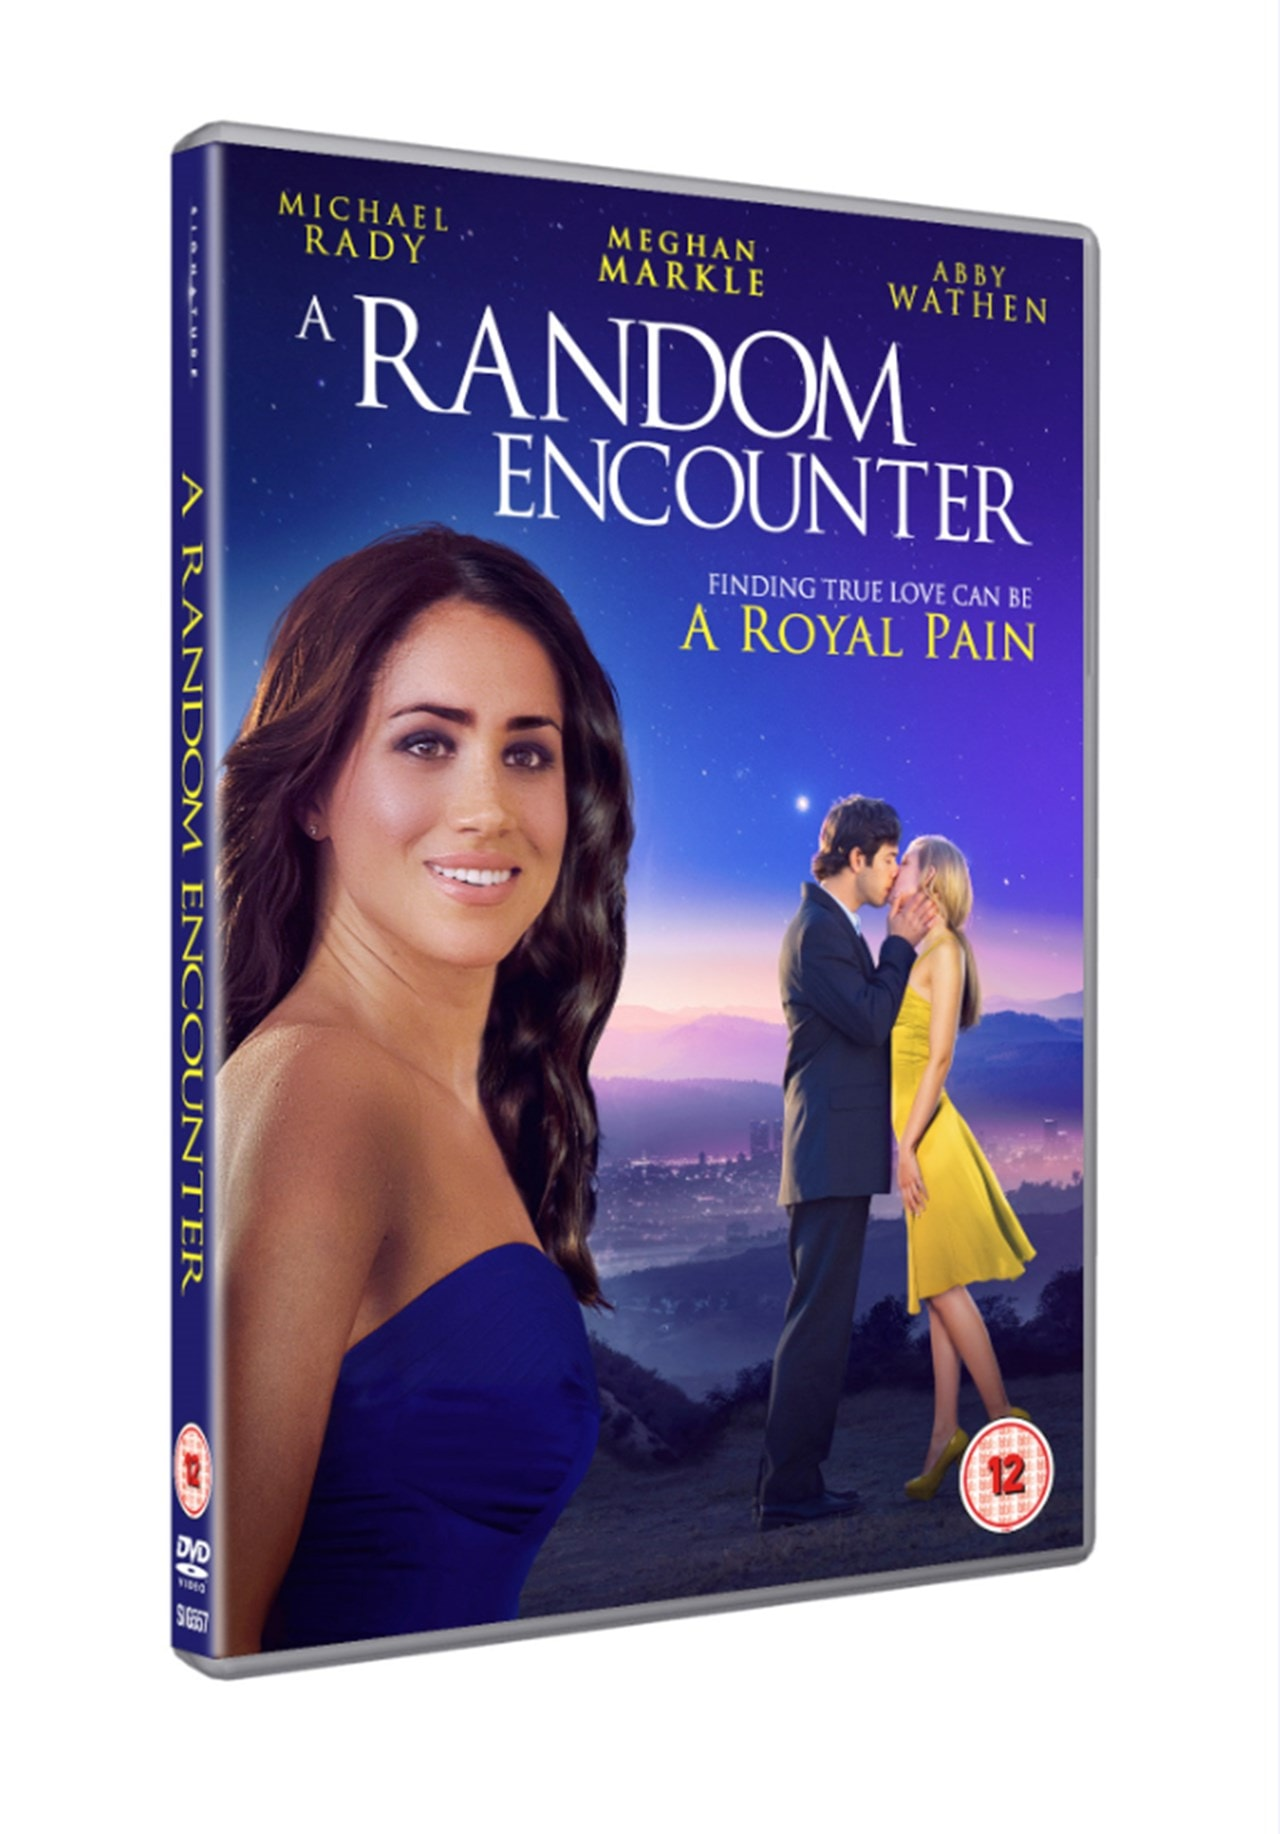 A Random Encounter - 2